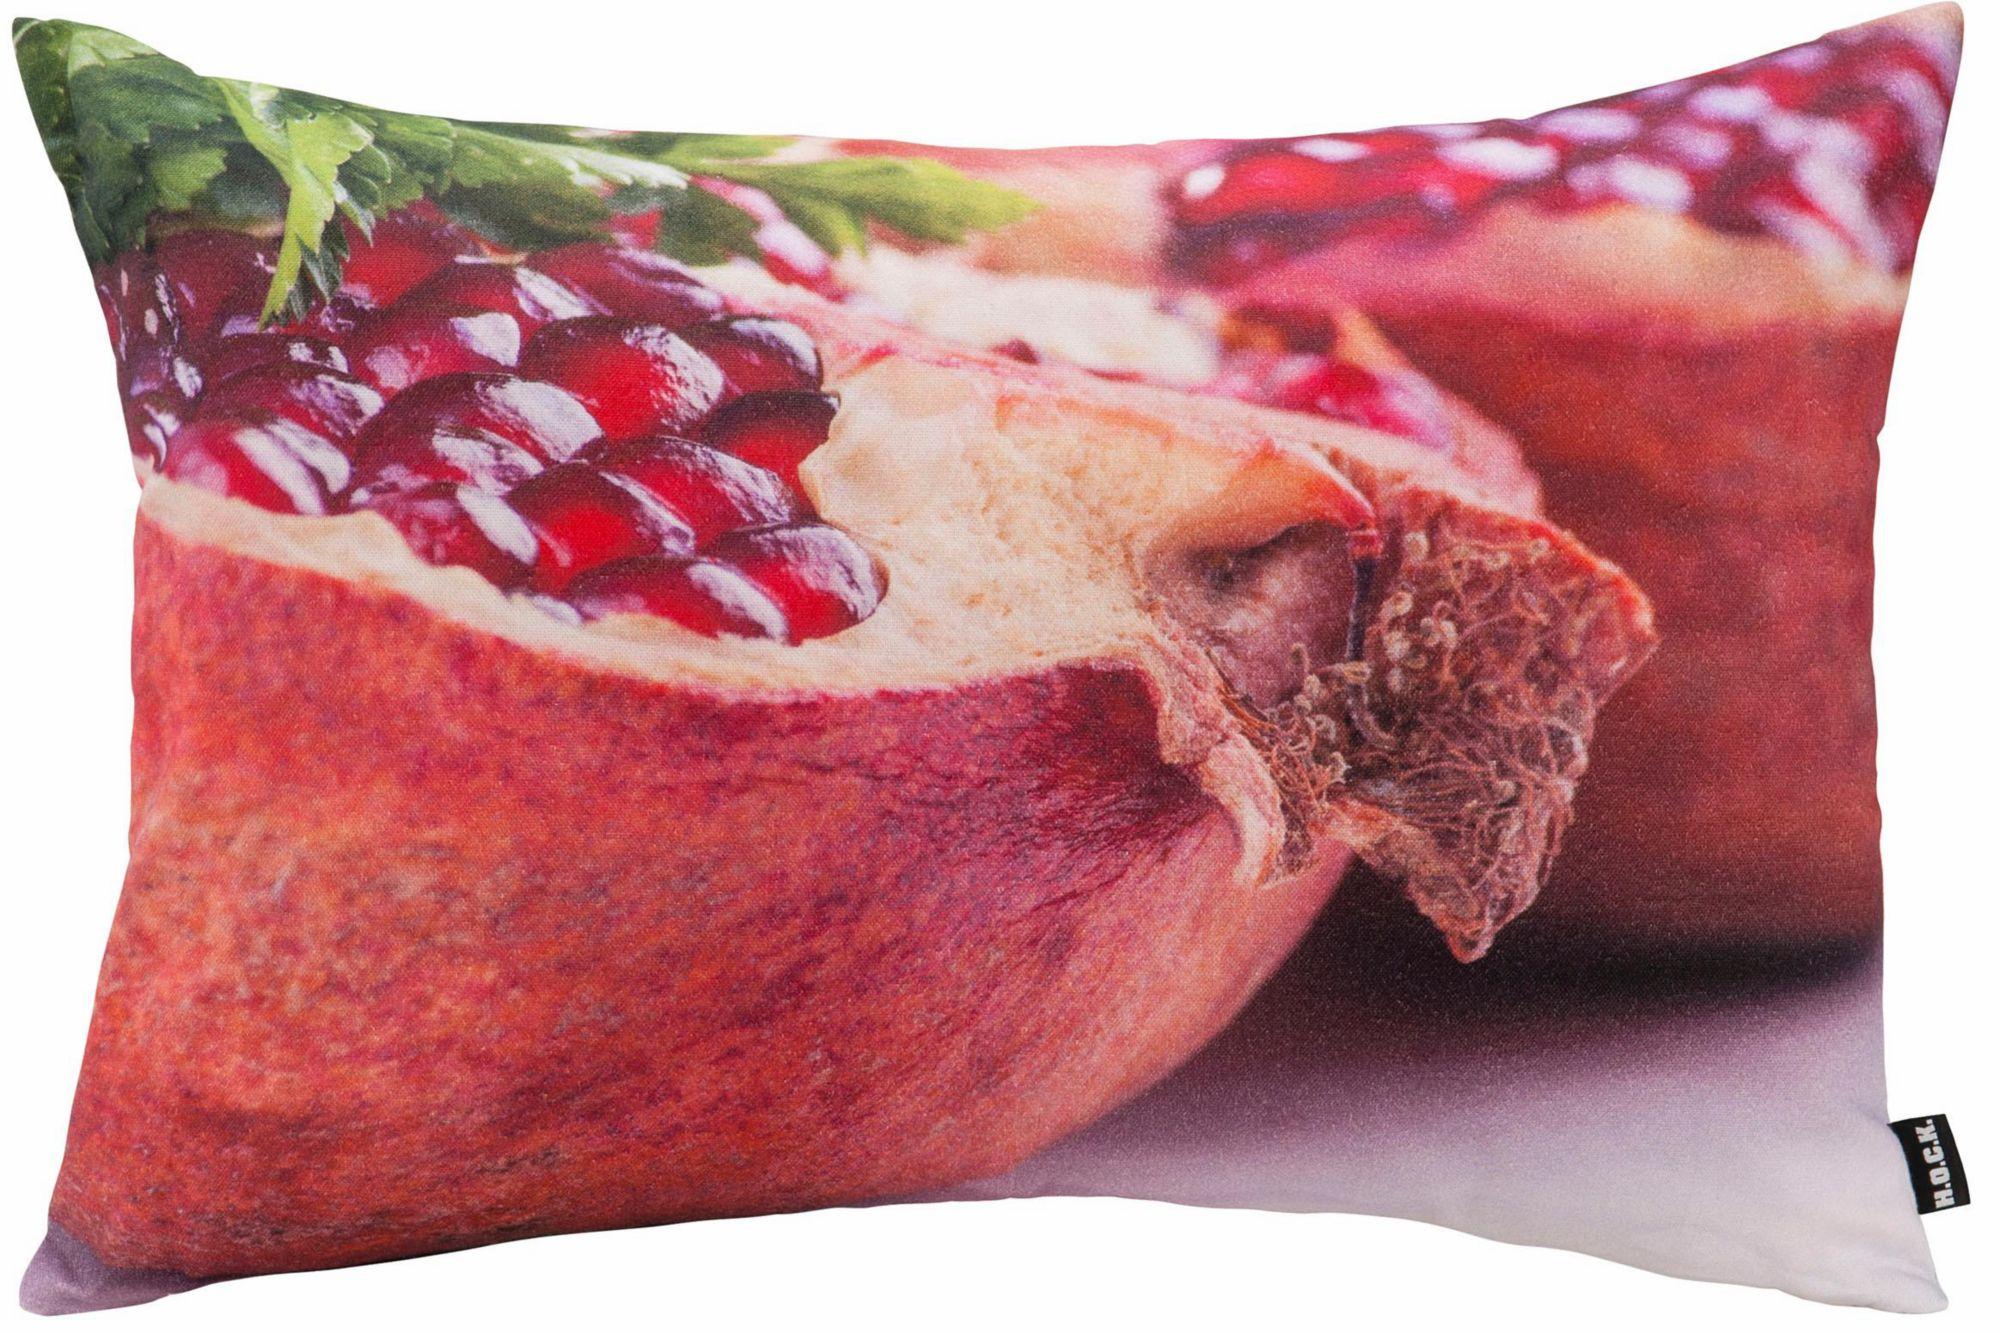 HOCK Hock Kissen mit Granatapfelmotiv